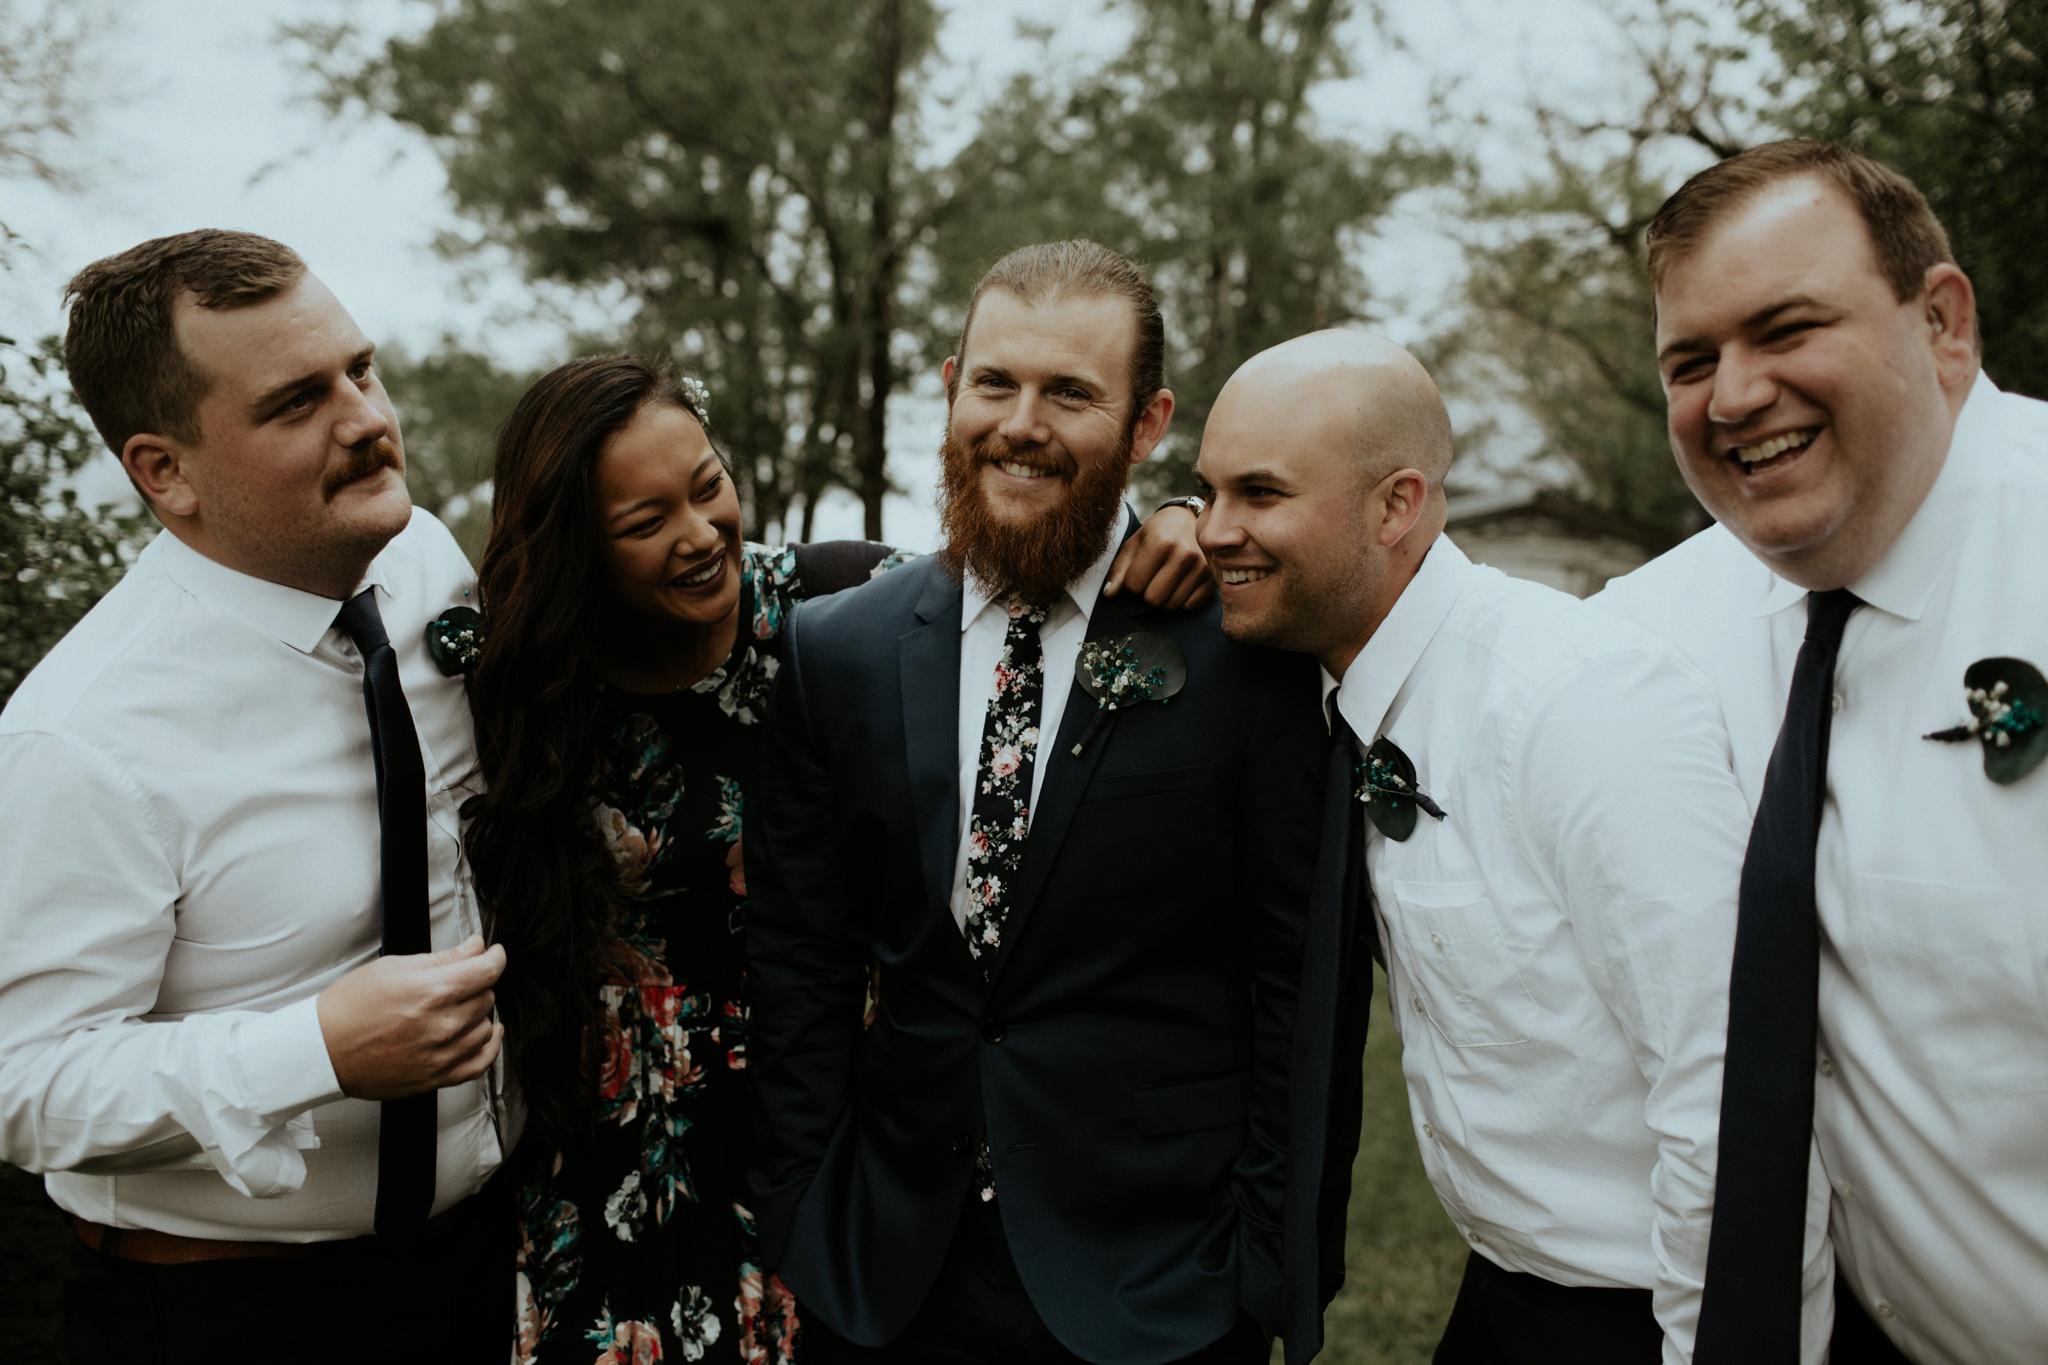 trinjensen photography, nebraska outdoor wedding photographer_3030.jpg